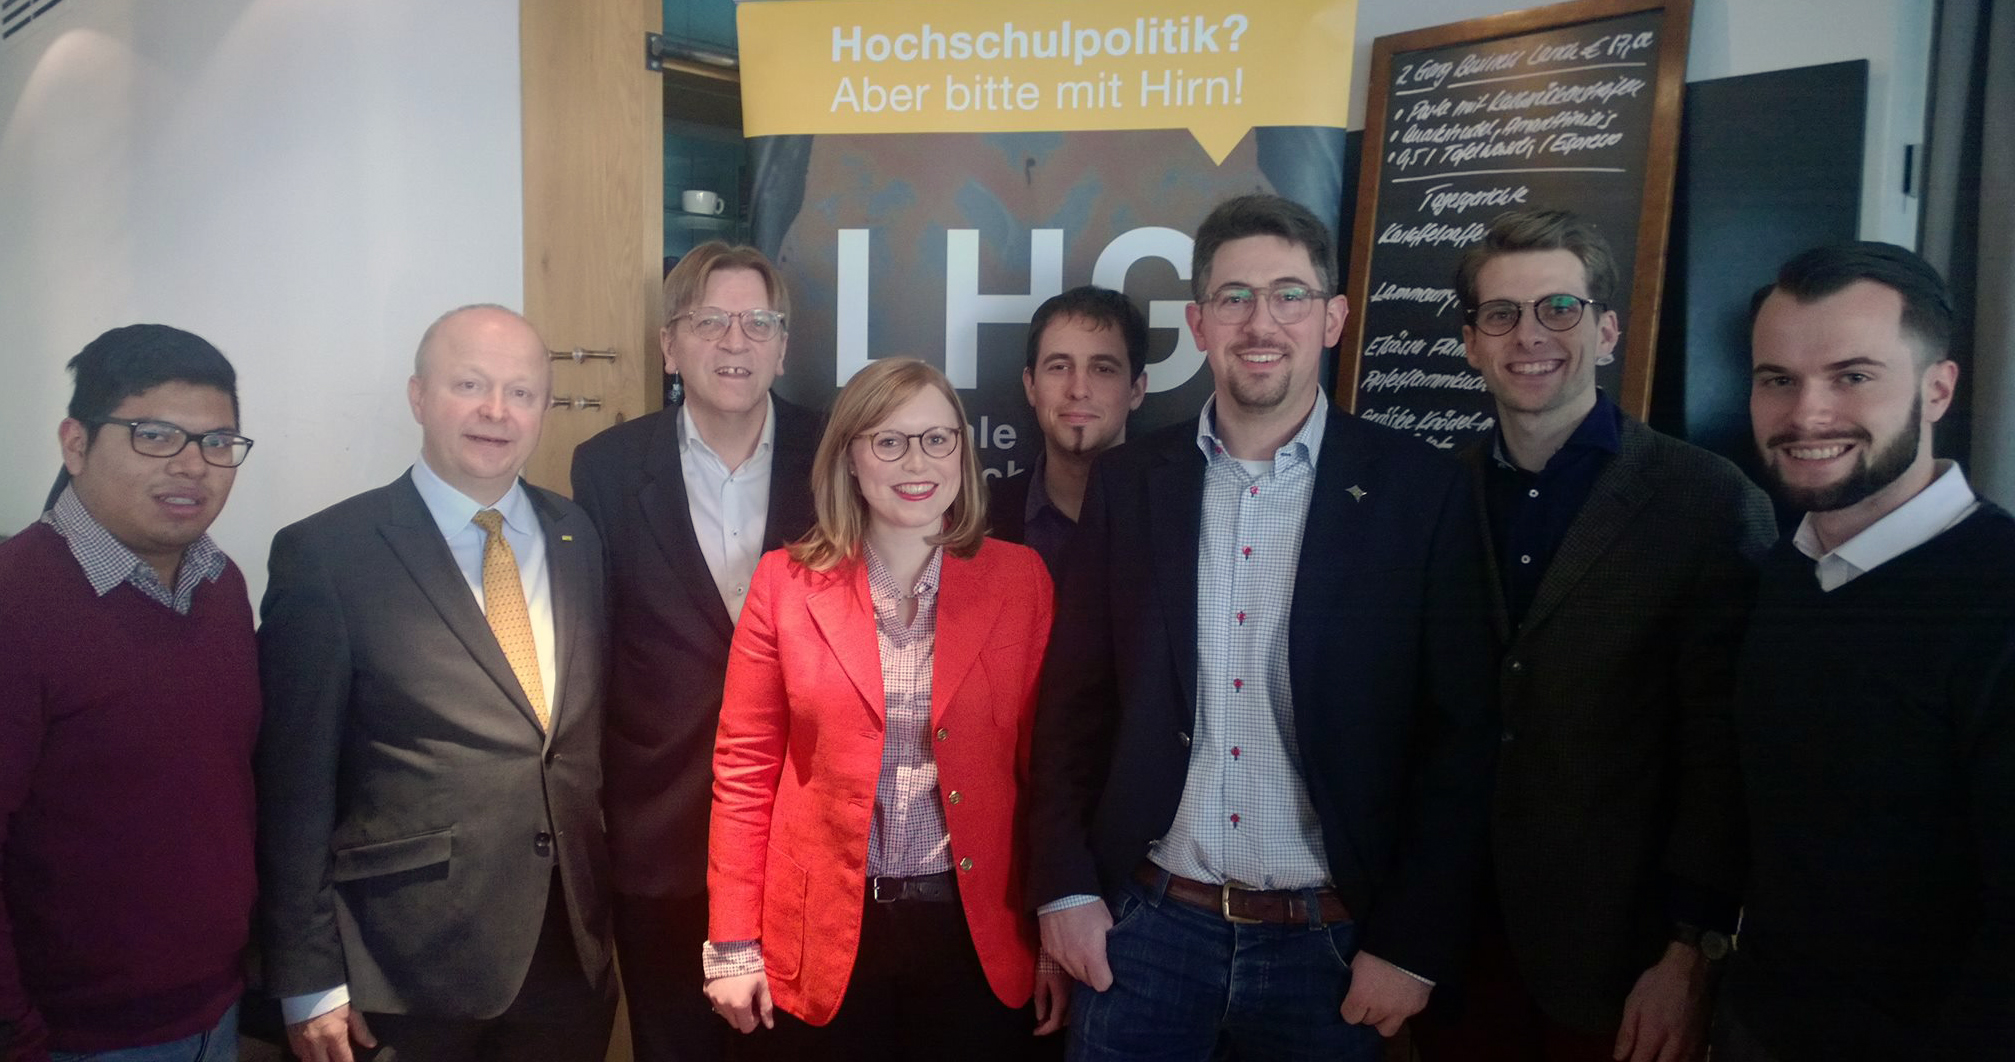 v. l.: Johannes Dallheimer, Michael Theurer, Guy Verhofstadt, Sophia Eder, Mark Dornbach, Alexander Schopf, Daniel Eberz, Tilman Schmeller